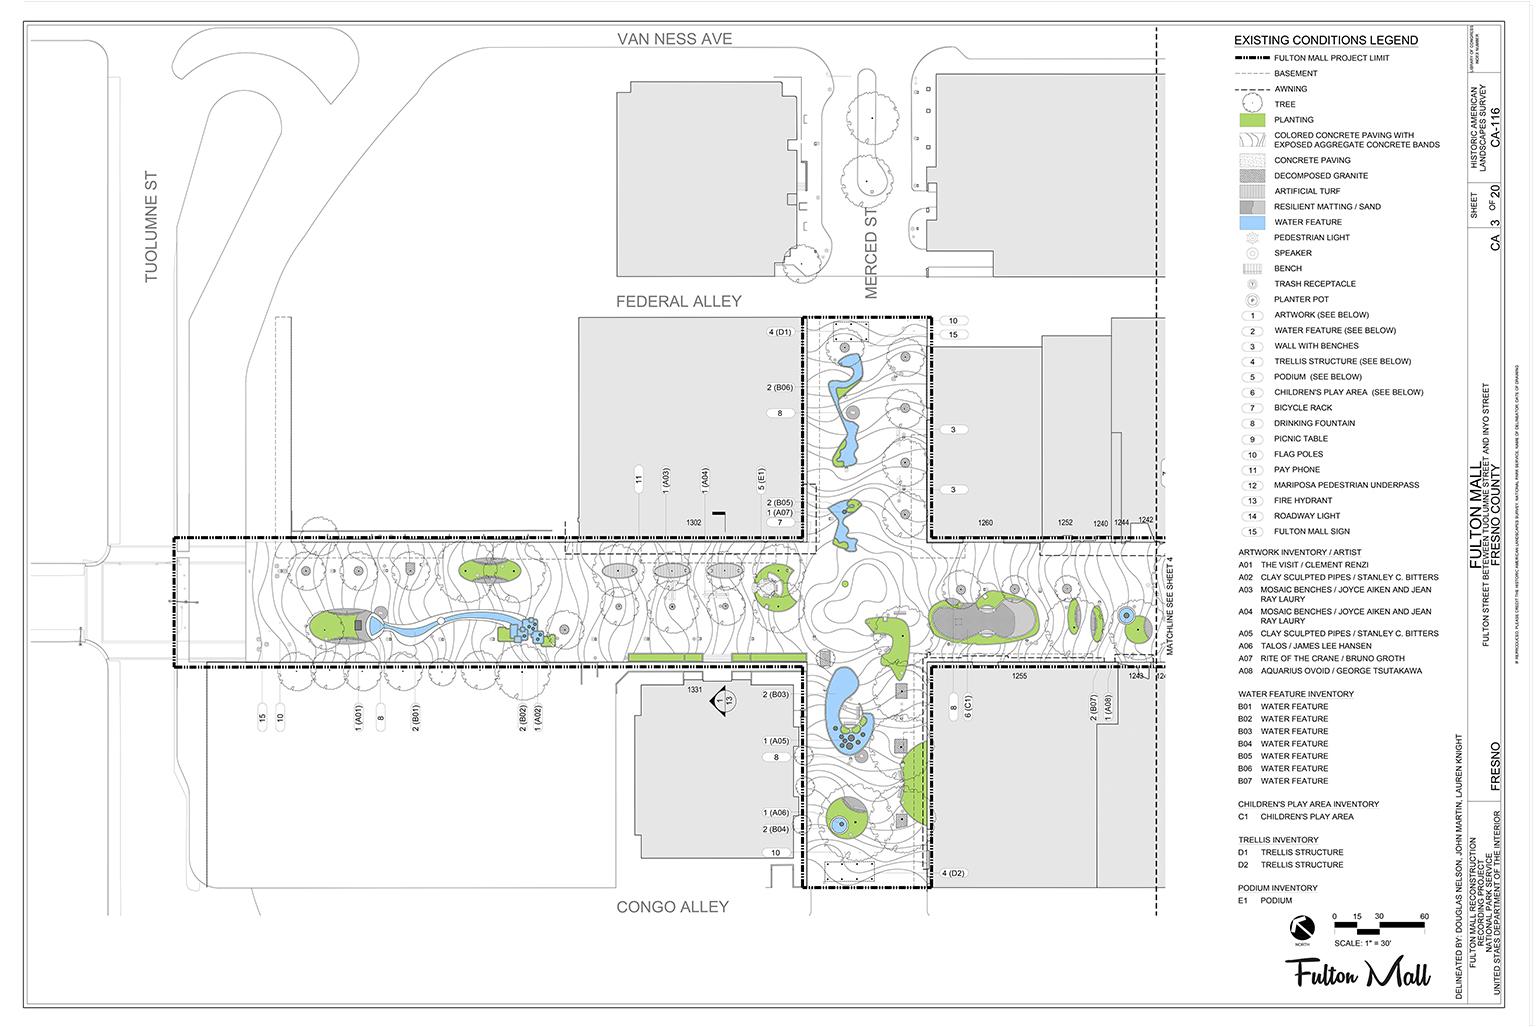 Fulton Mall Historic American Landscape Report Survey (HALS)